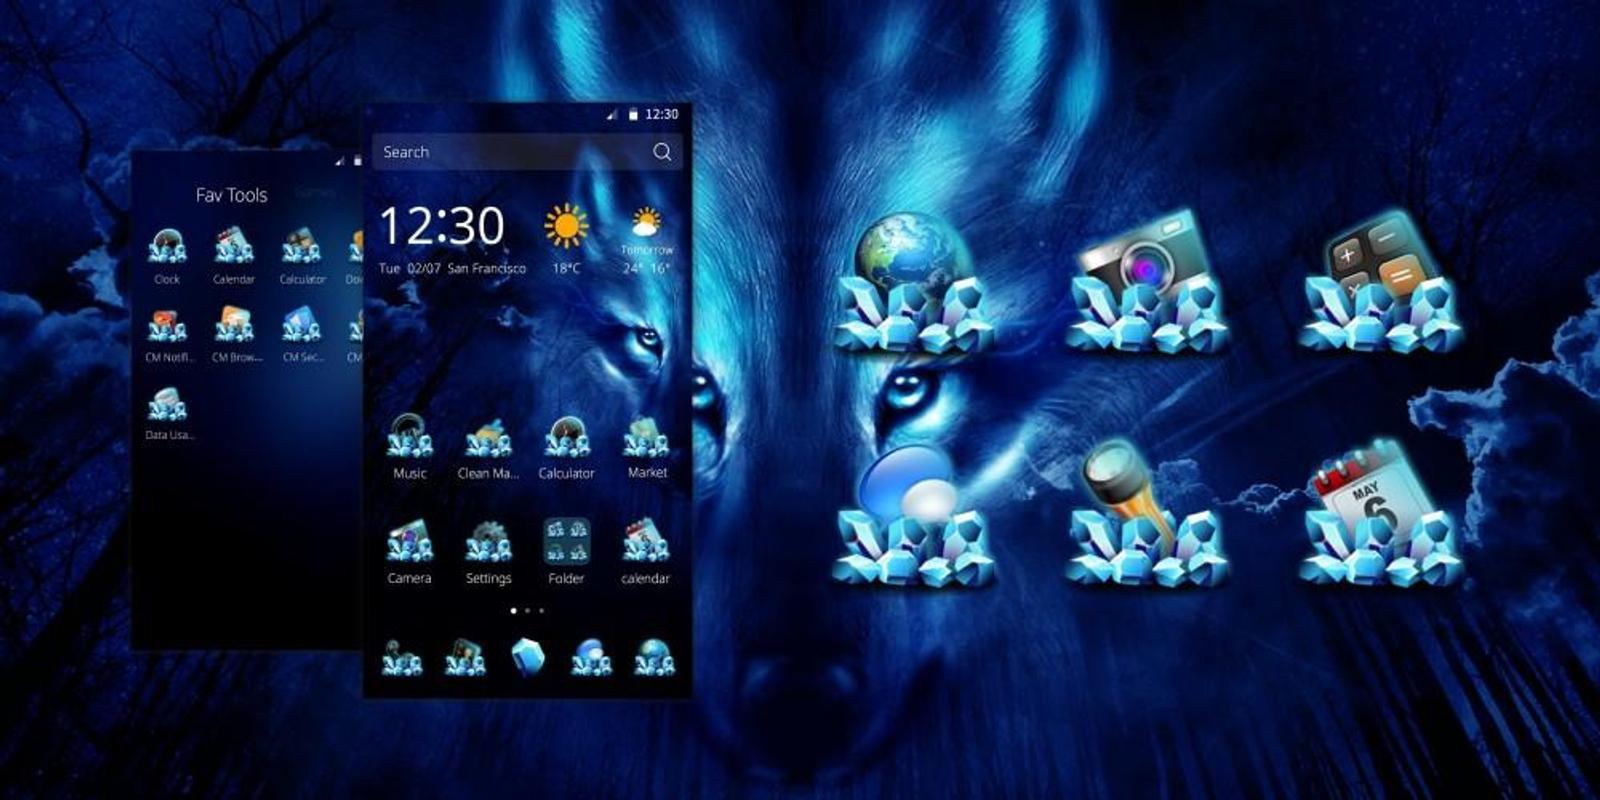 Unduh Wallpaper Pubg Hd Apk Versi Terbaru Aplikasi Untuk: Free Serigala Malam Tema APK Download